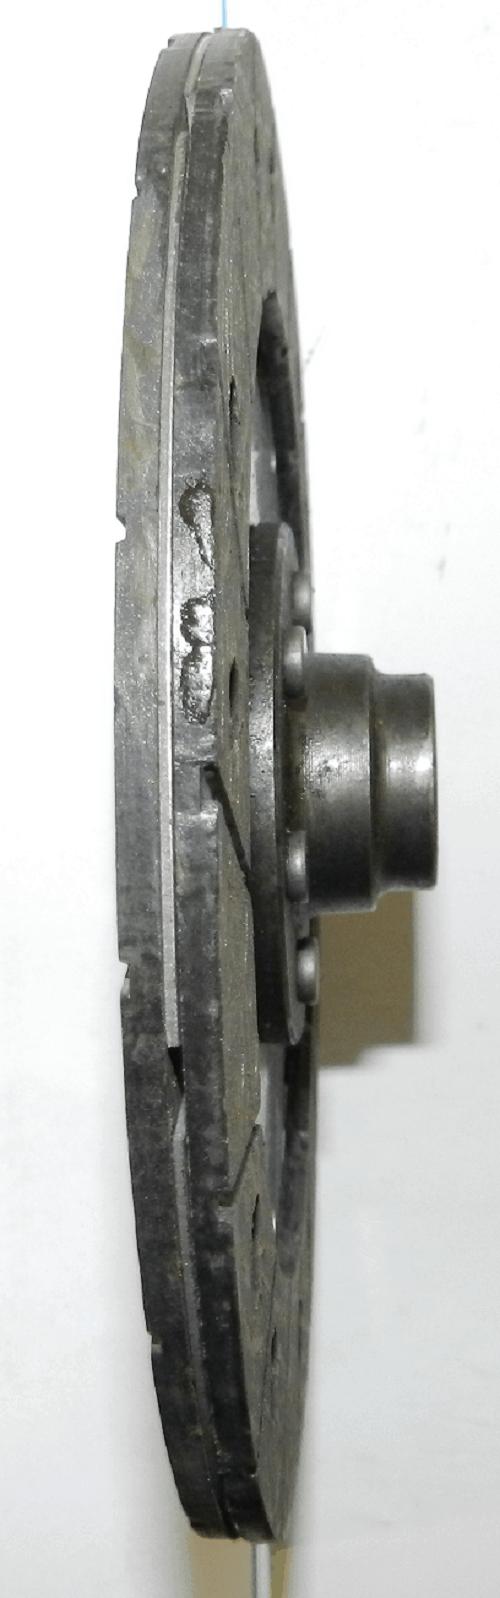 Disco Frizione 160x13x22 - T1613220